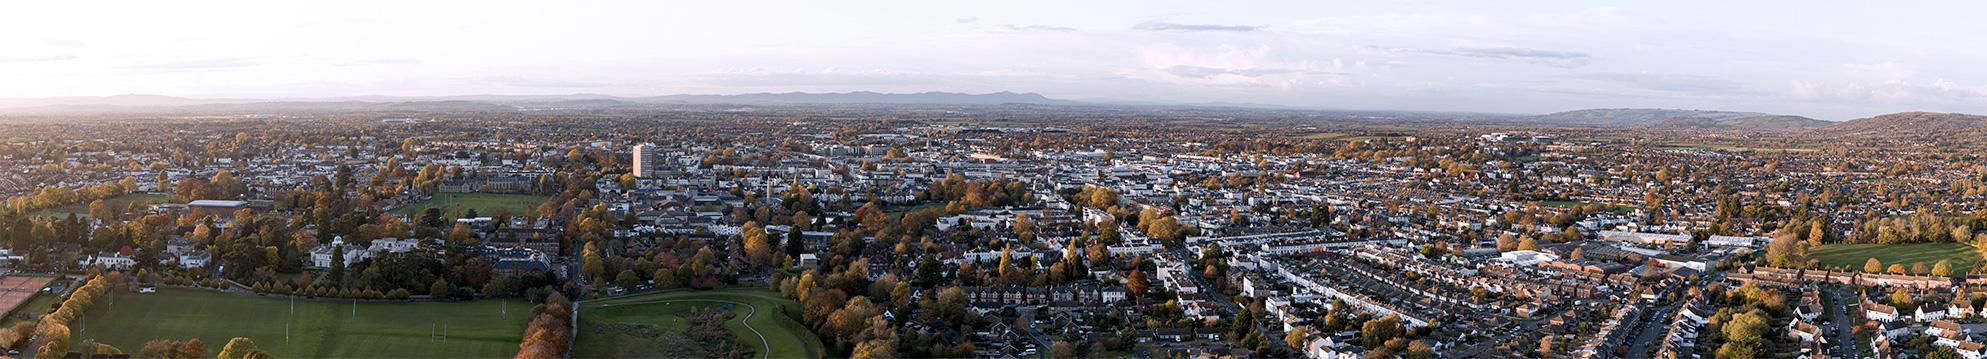 Cheltenham_drone_image